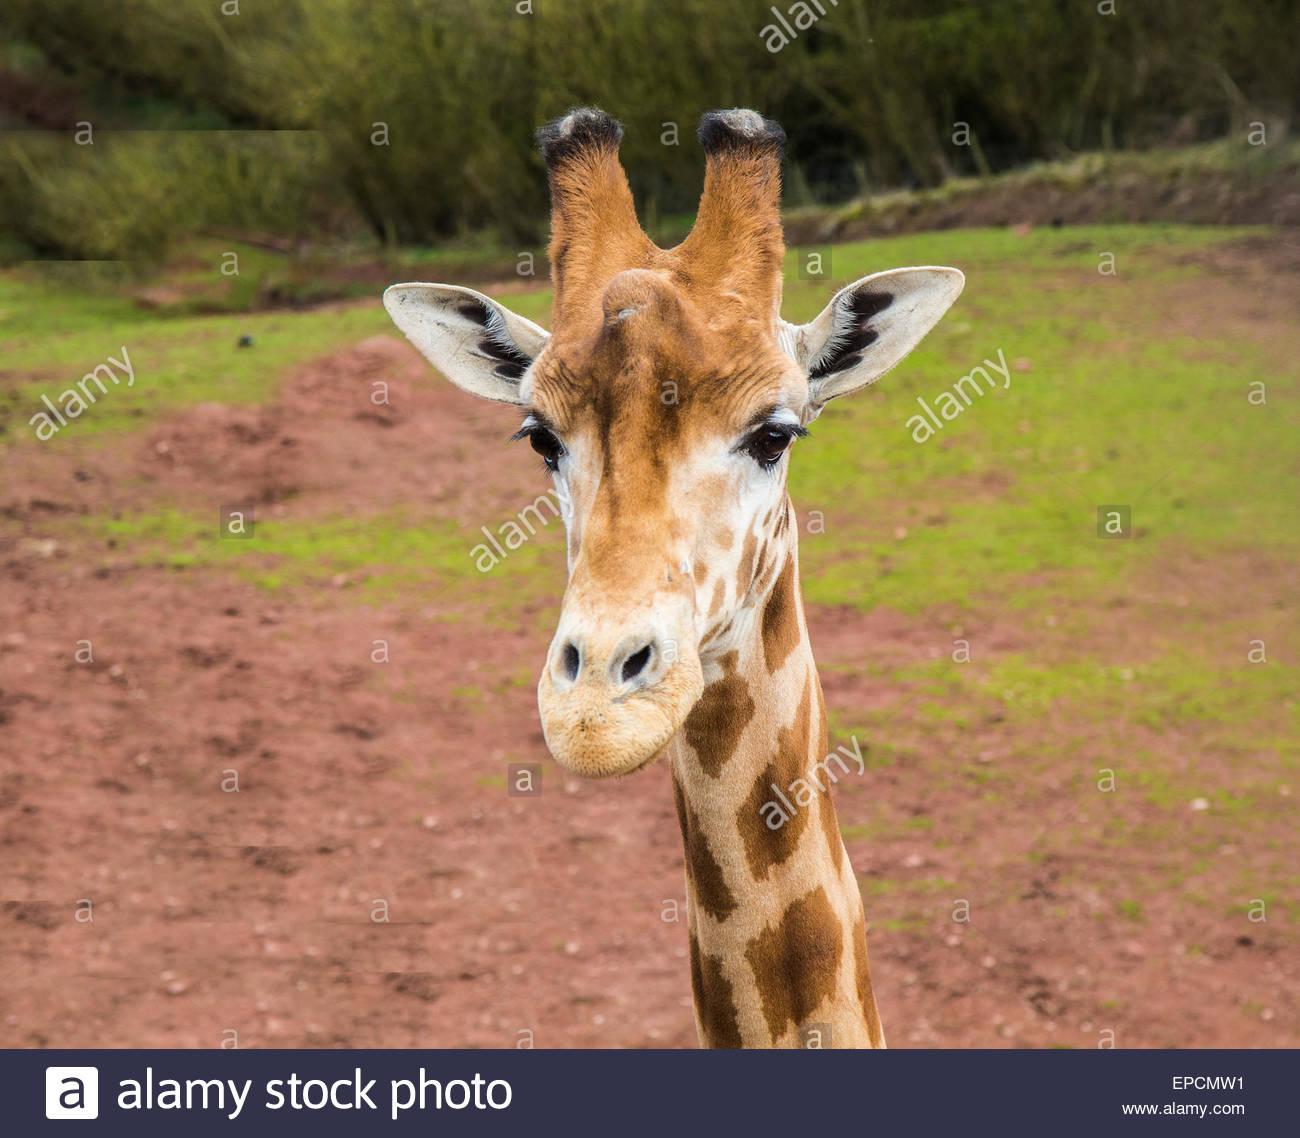 Curious young giraffe Stock Photo